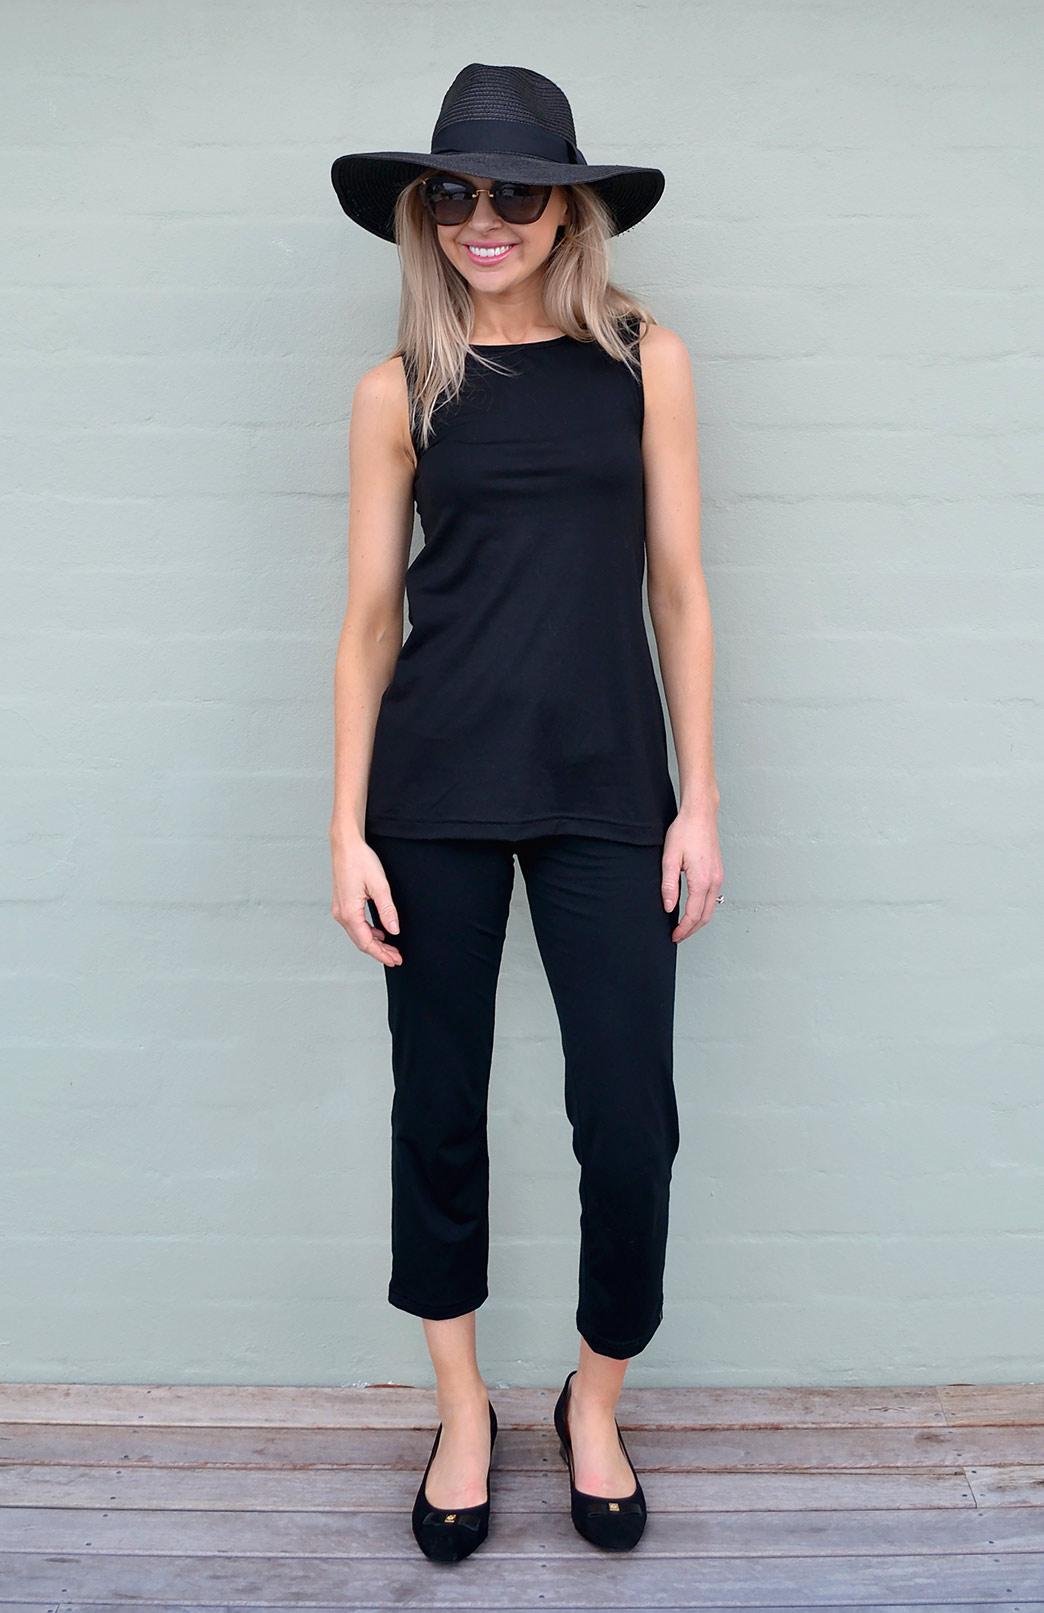 Capri Pants - Women's Black Merino Wool Lightweight 7/8th Crop Pants - Smitten Merino Tasmania Australia